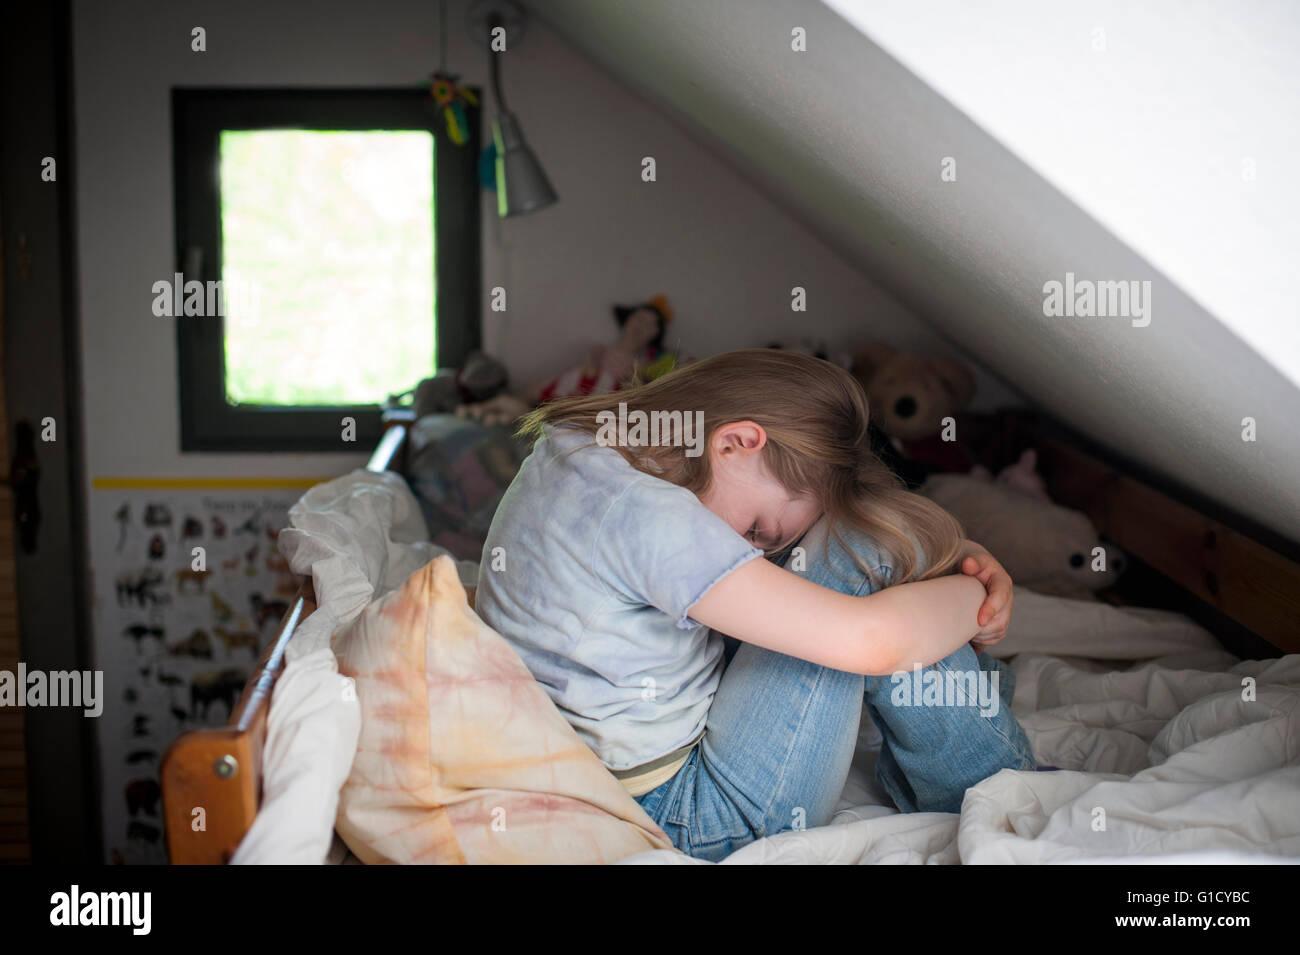 Young girl upset it her bedroom. - Stock Image